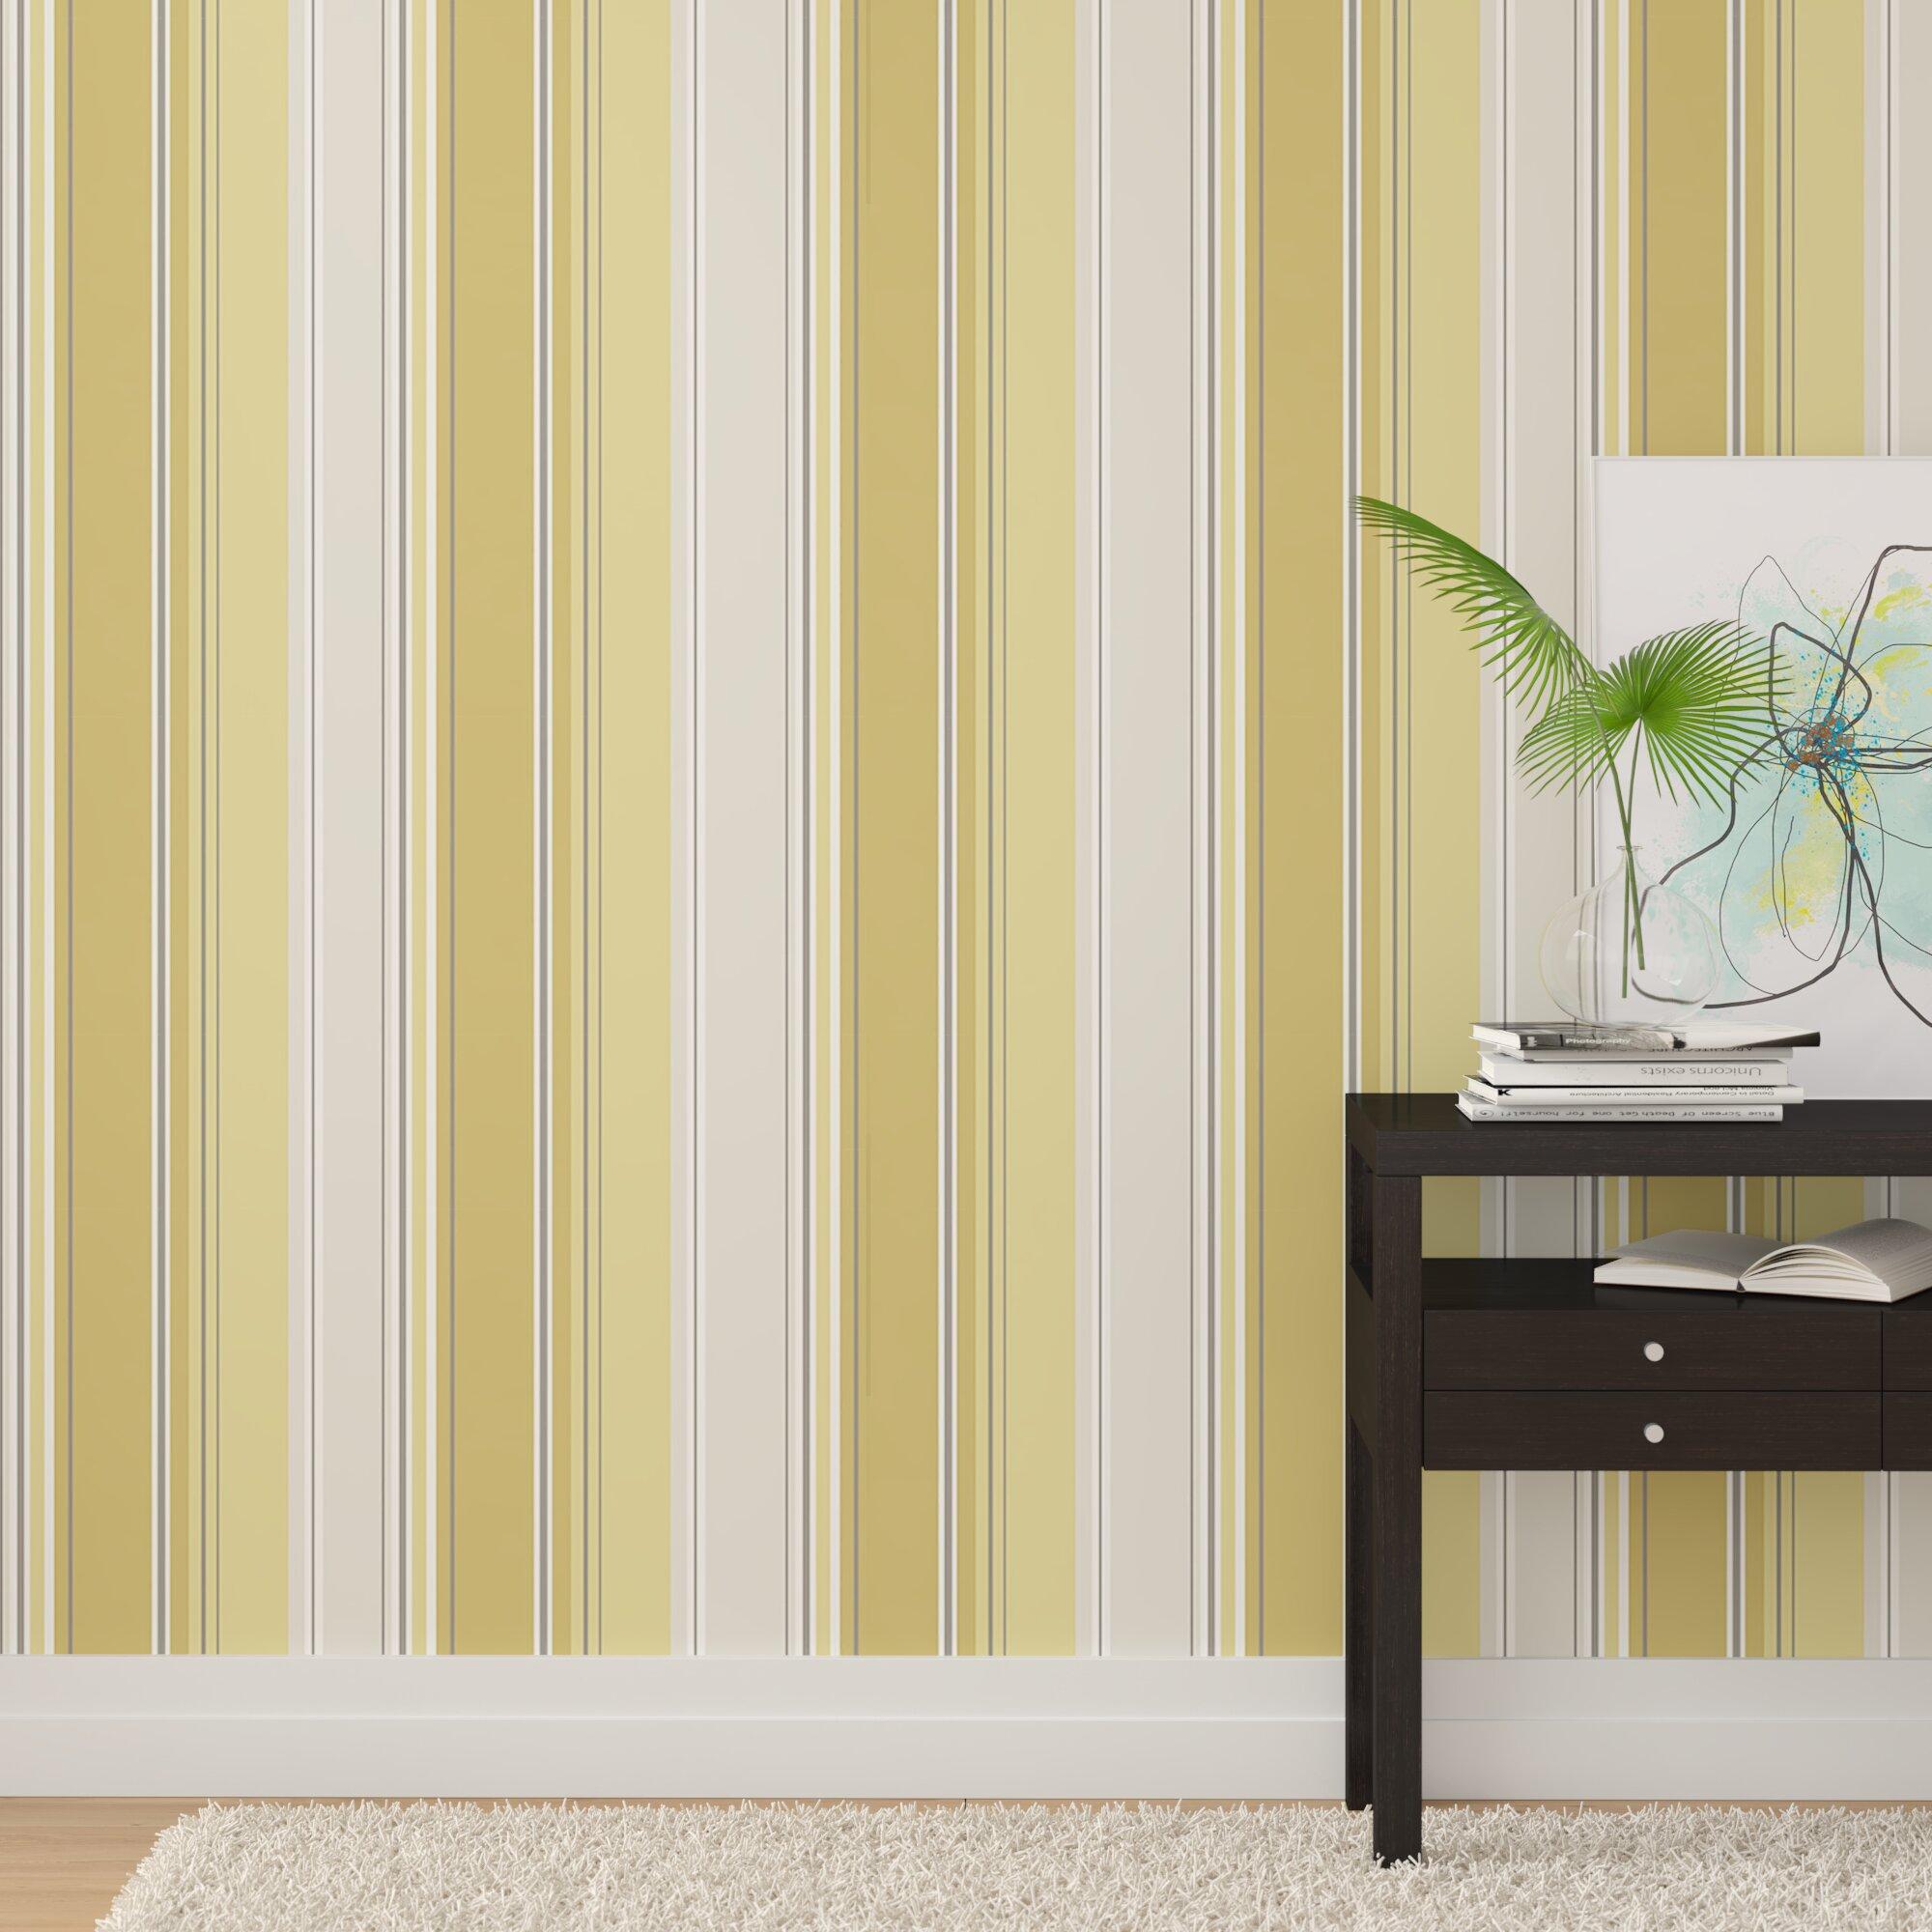 Ebern Designs Bodie Striped 33 L x 205 W Wallpaper Roll Wayfair 2000x2000